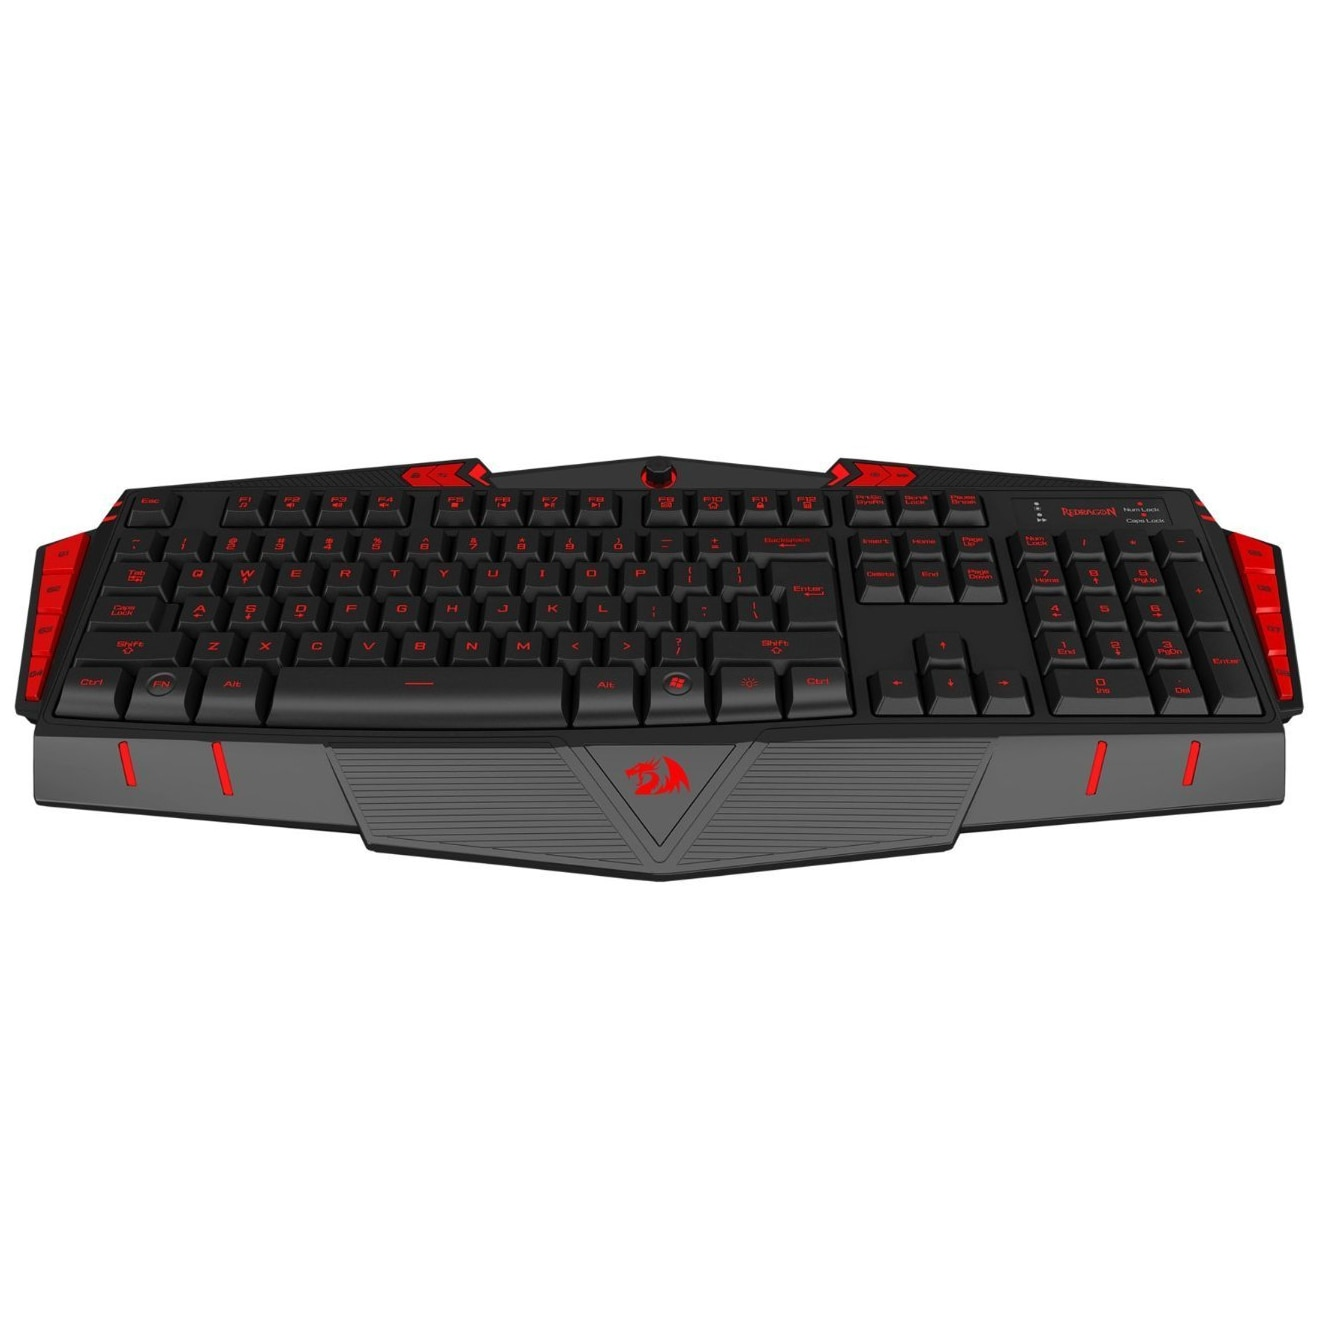 Fotografie Tastatura Gaming Redragon Asura, Iluminata, USB, Negru